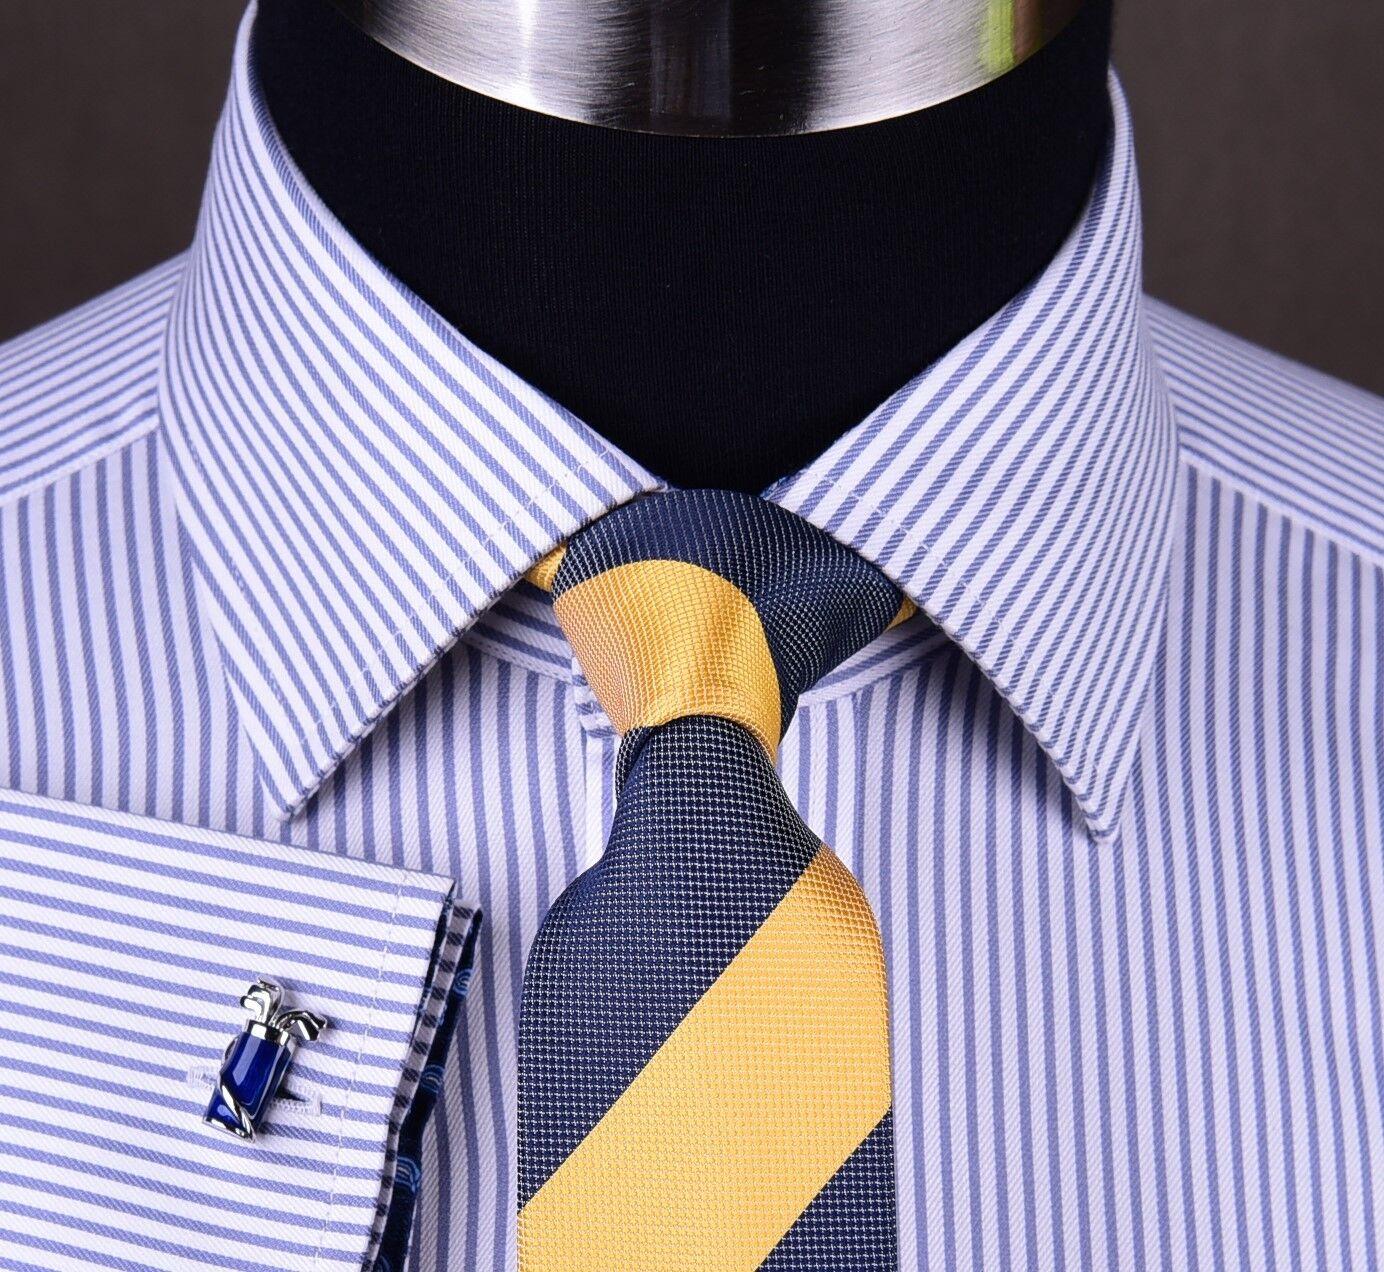 Mens Purple Striped Formal Business Dress Shirt Egyptian Cotton Boss Paisley Top